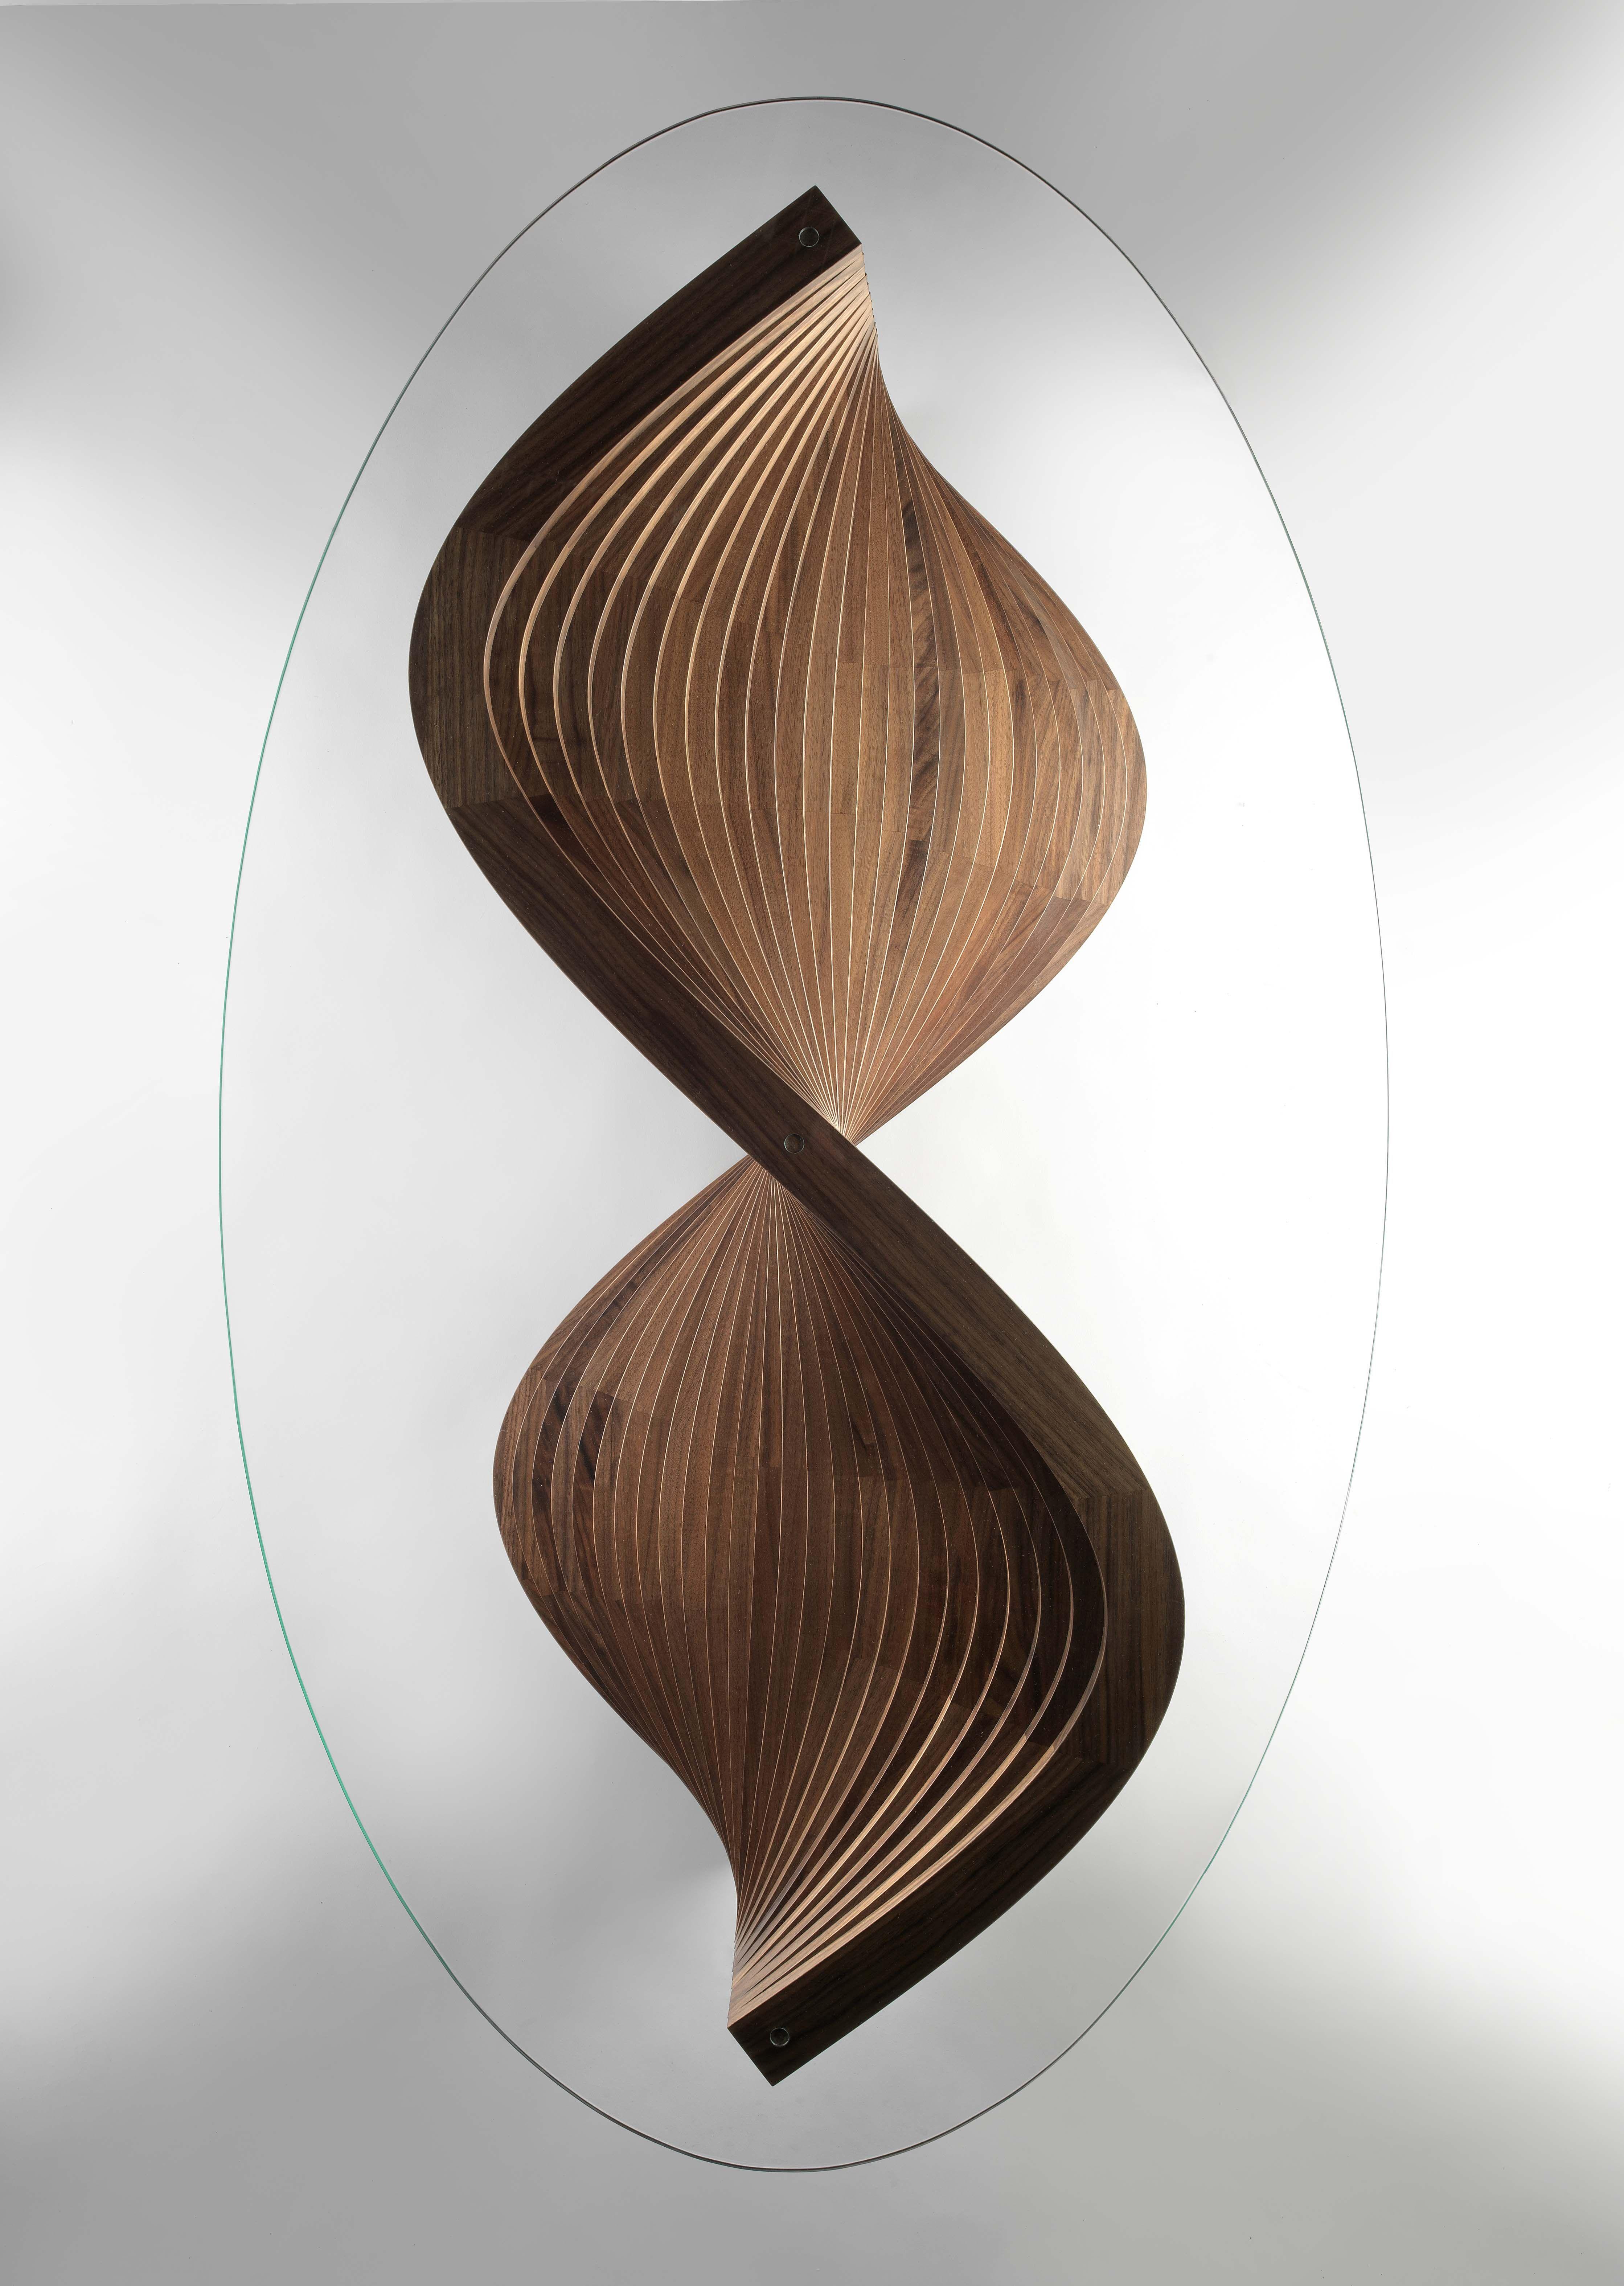 Garden chair top view - Sidewinder Sculptural Coffee Table Top View By David Tragen Http Davidtragen